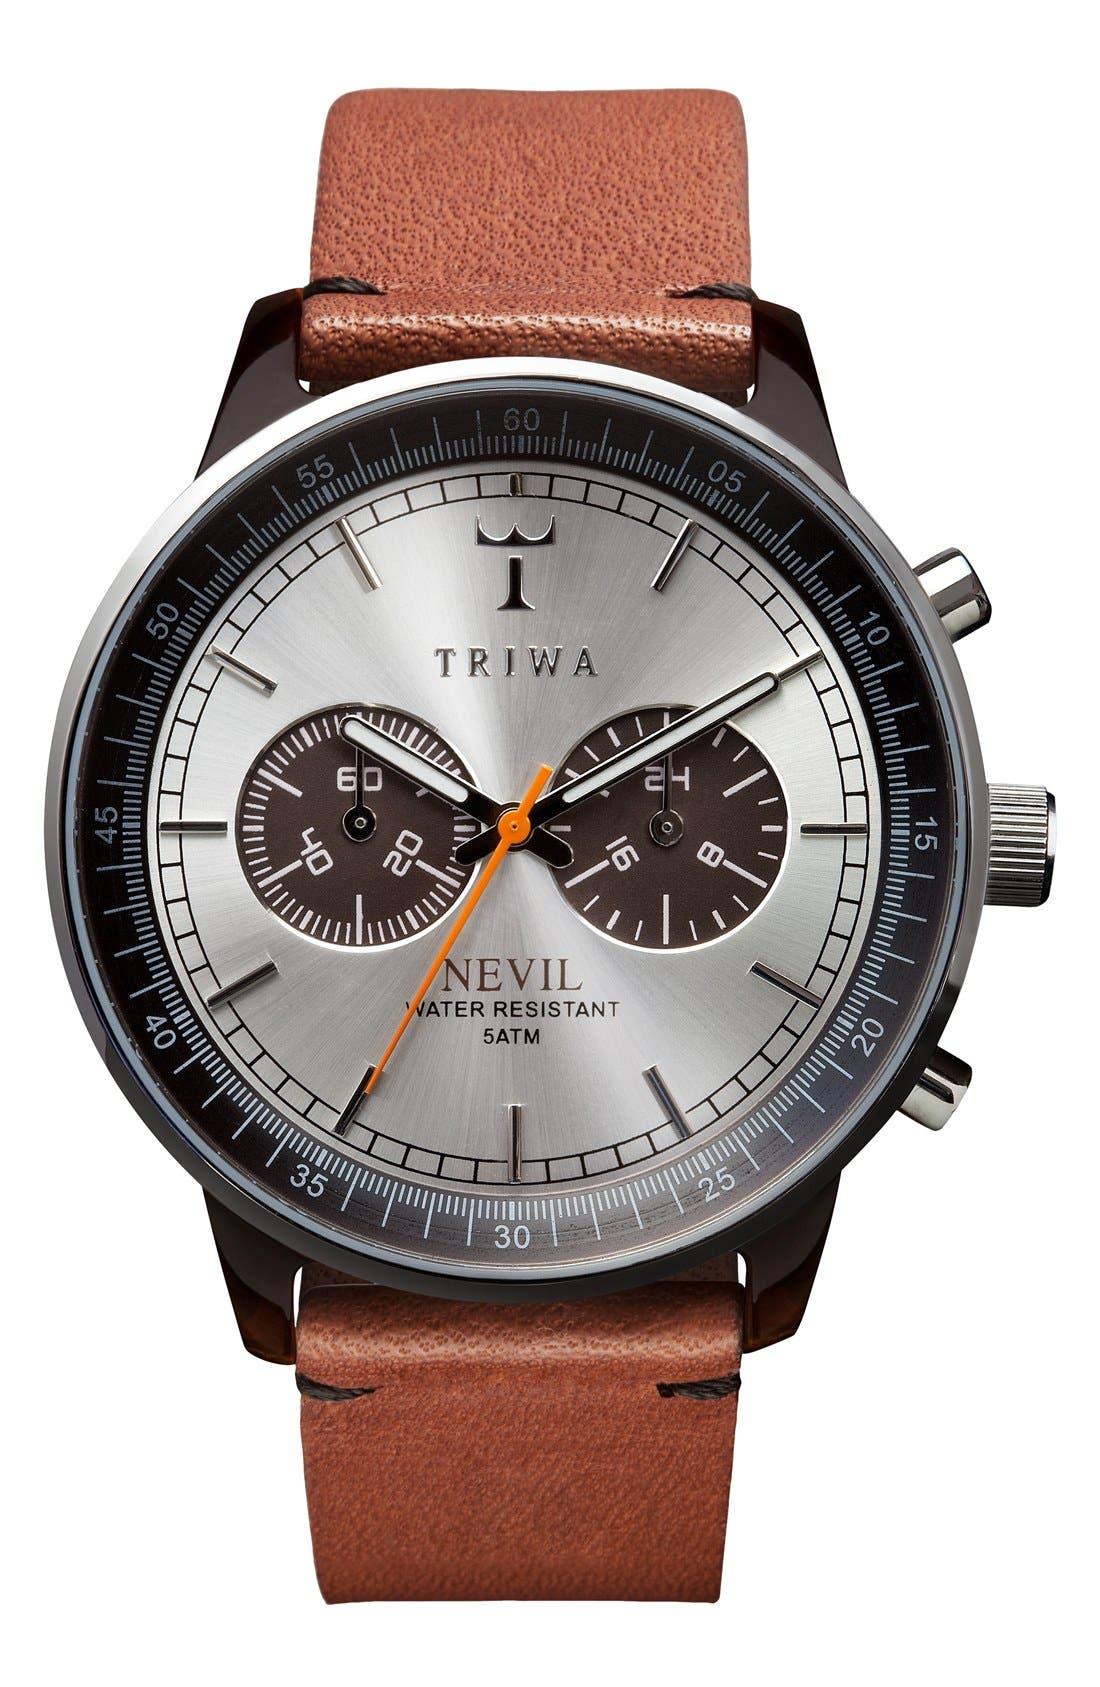 Main Image - TRIWA Nevil Chronograph Leather Strap, 42mm